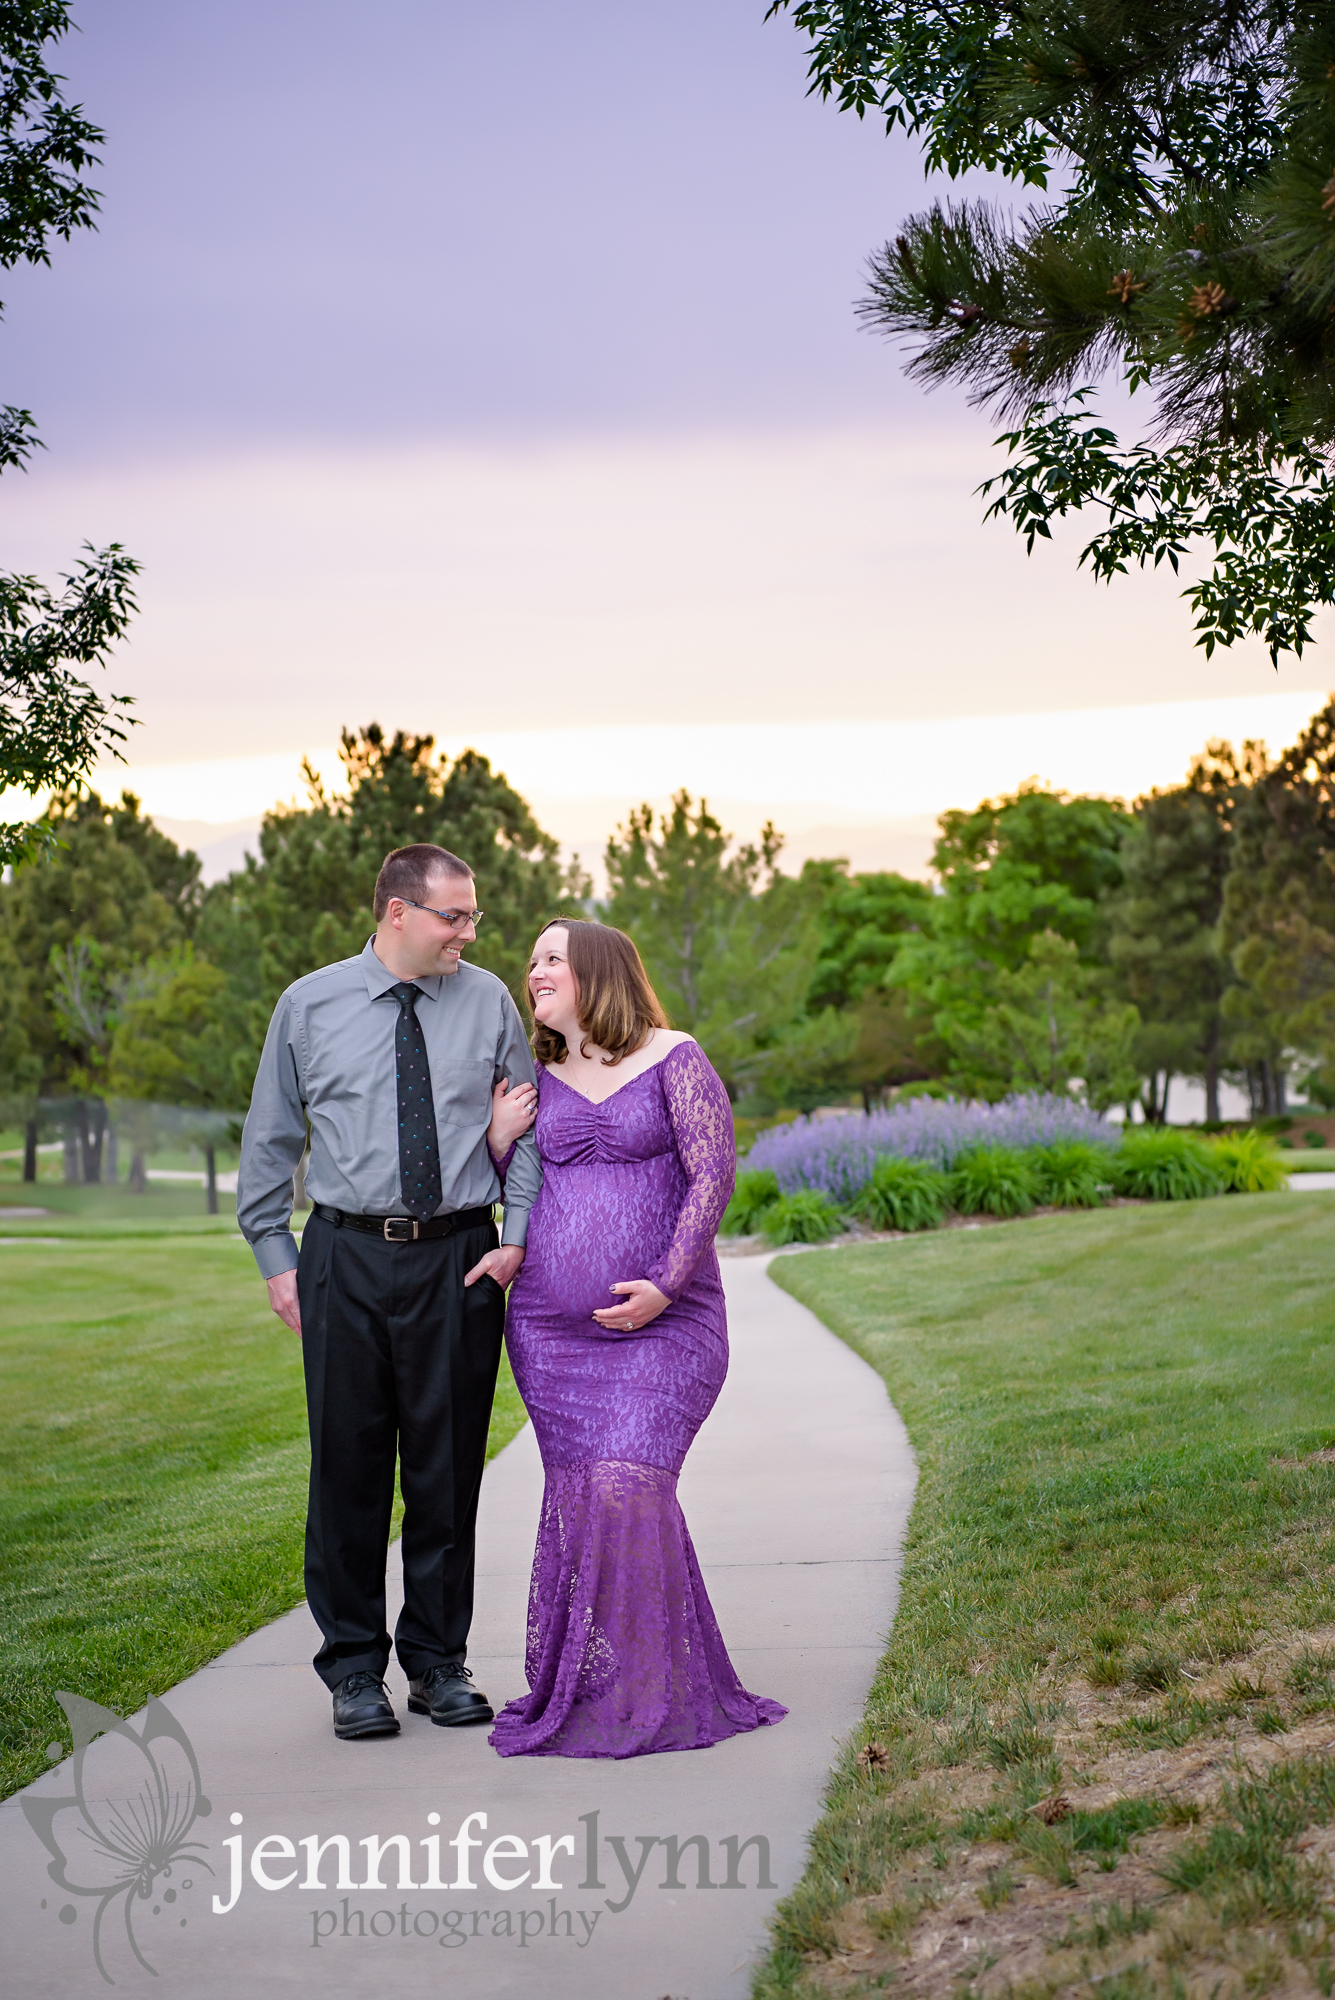 Maternity Couple Path at Sunset